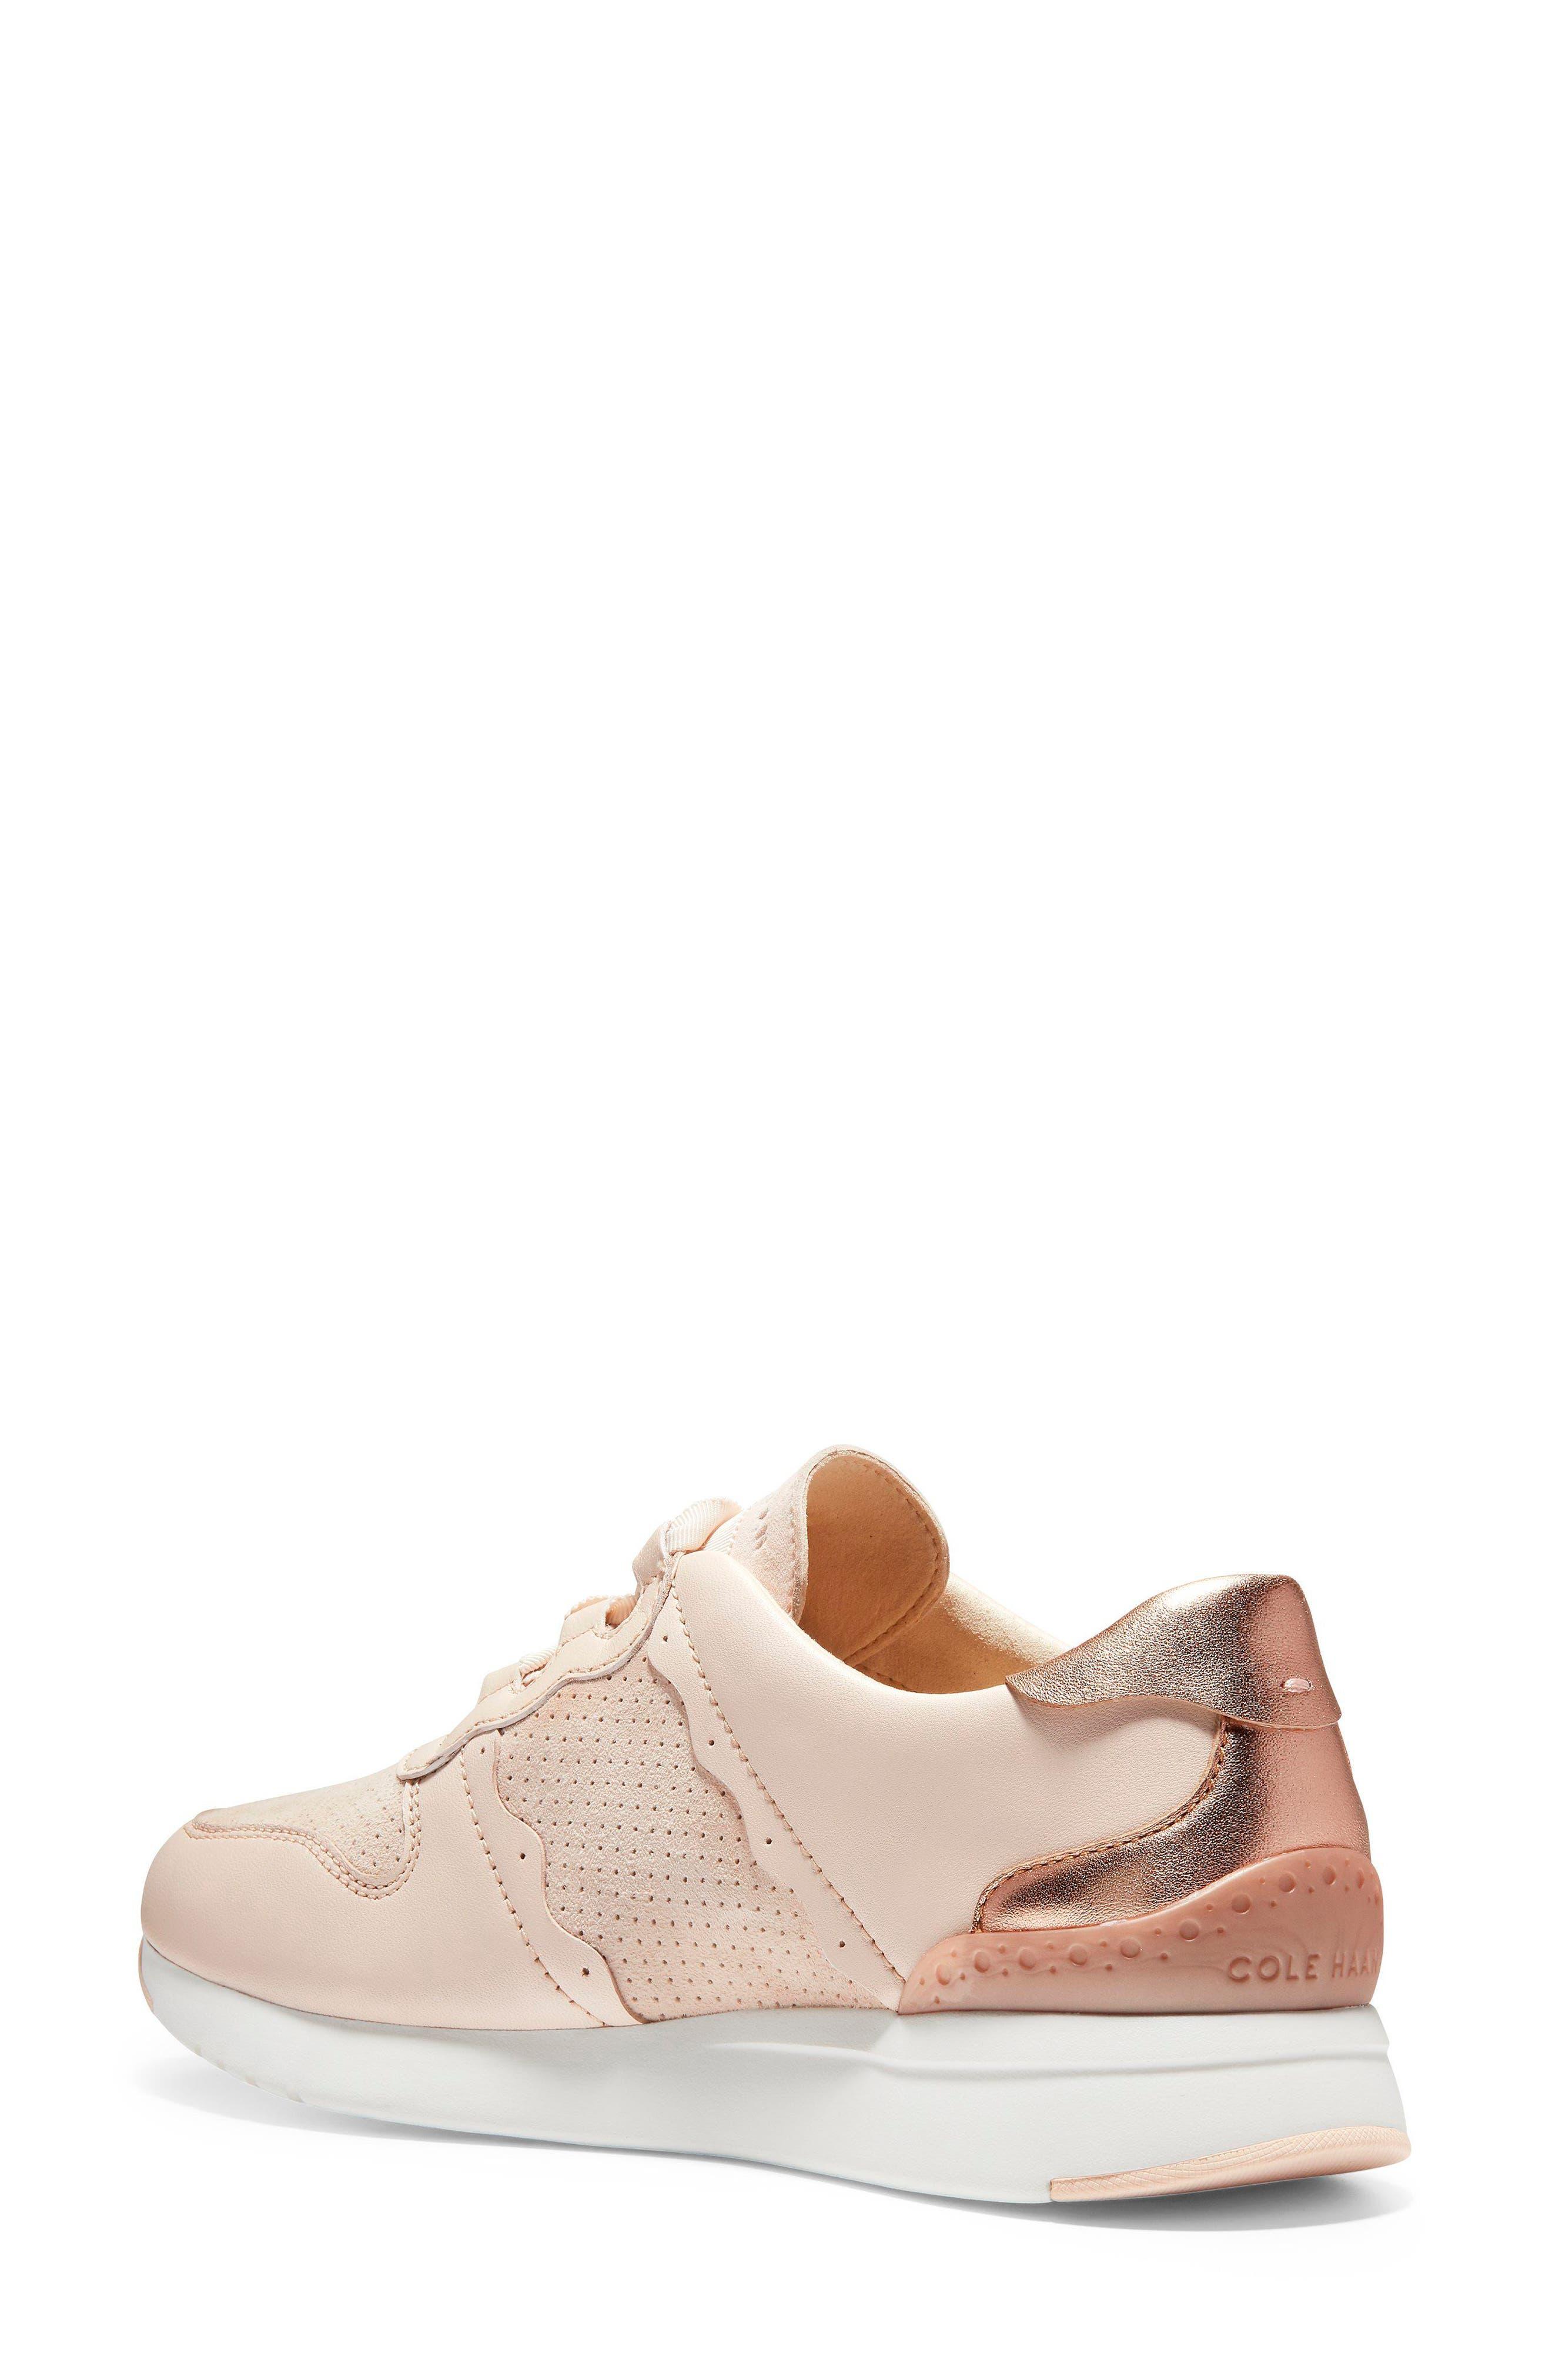 GrandPro Wedge Sneaker,                             Alternate thumbnail 2, color,                             Peach Blush Suede